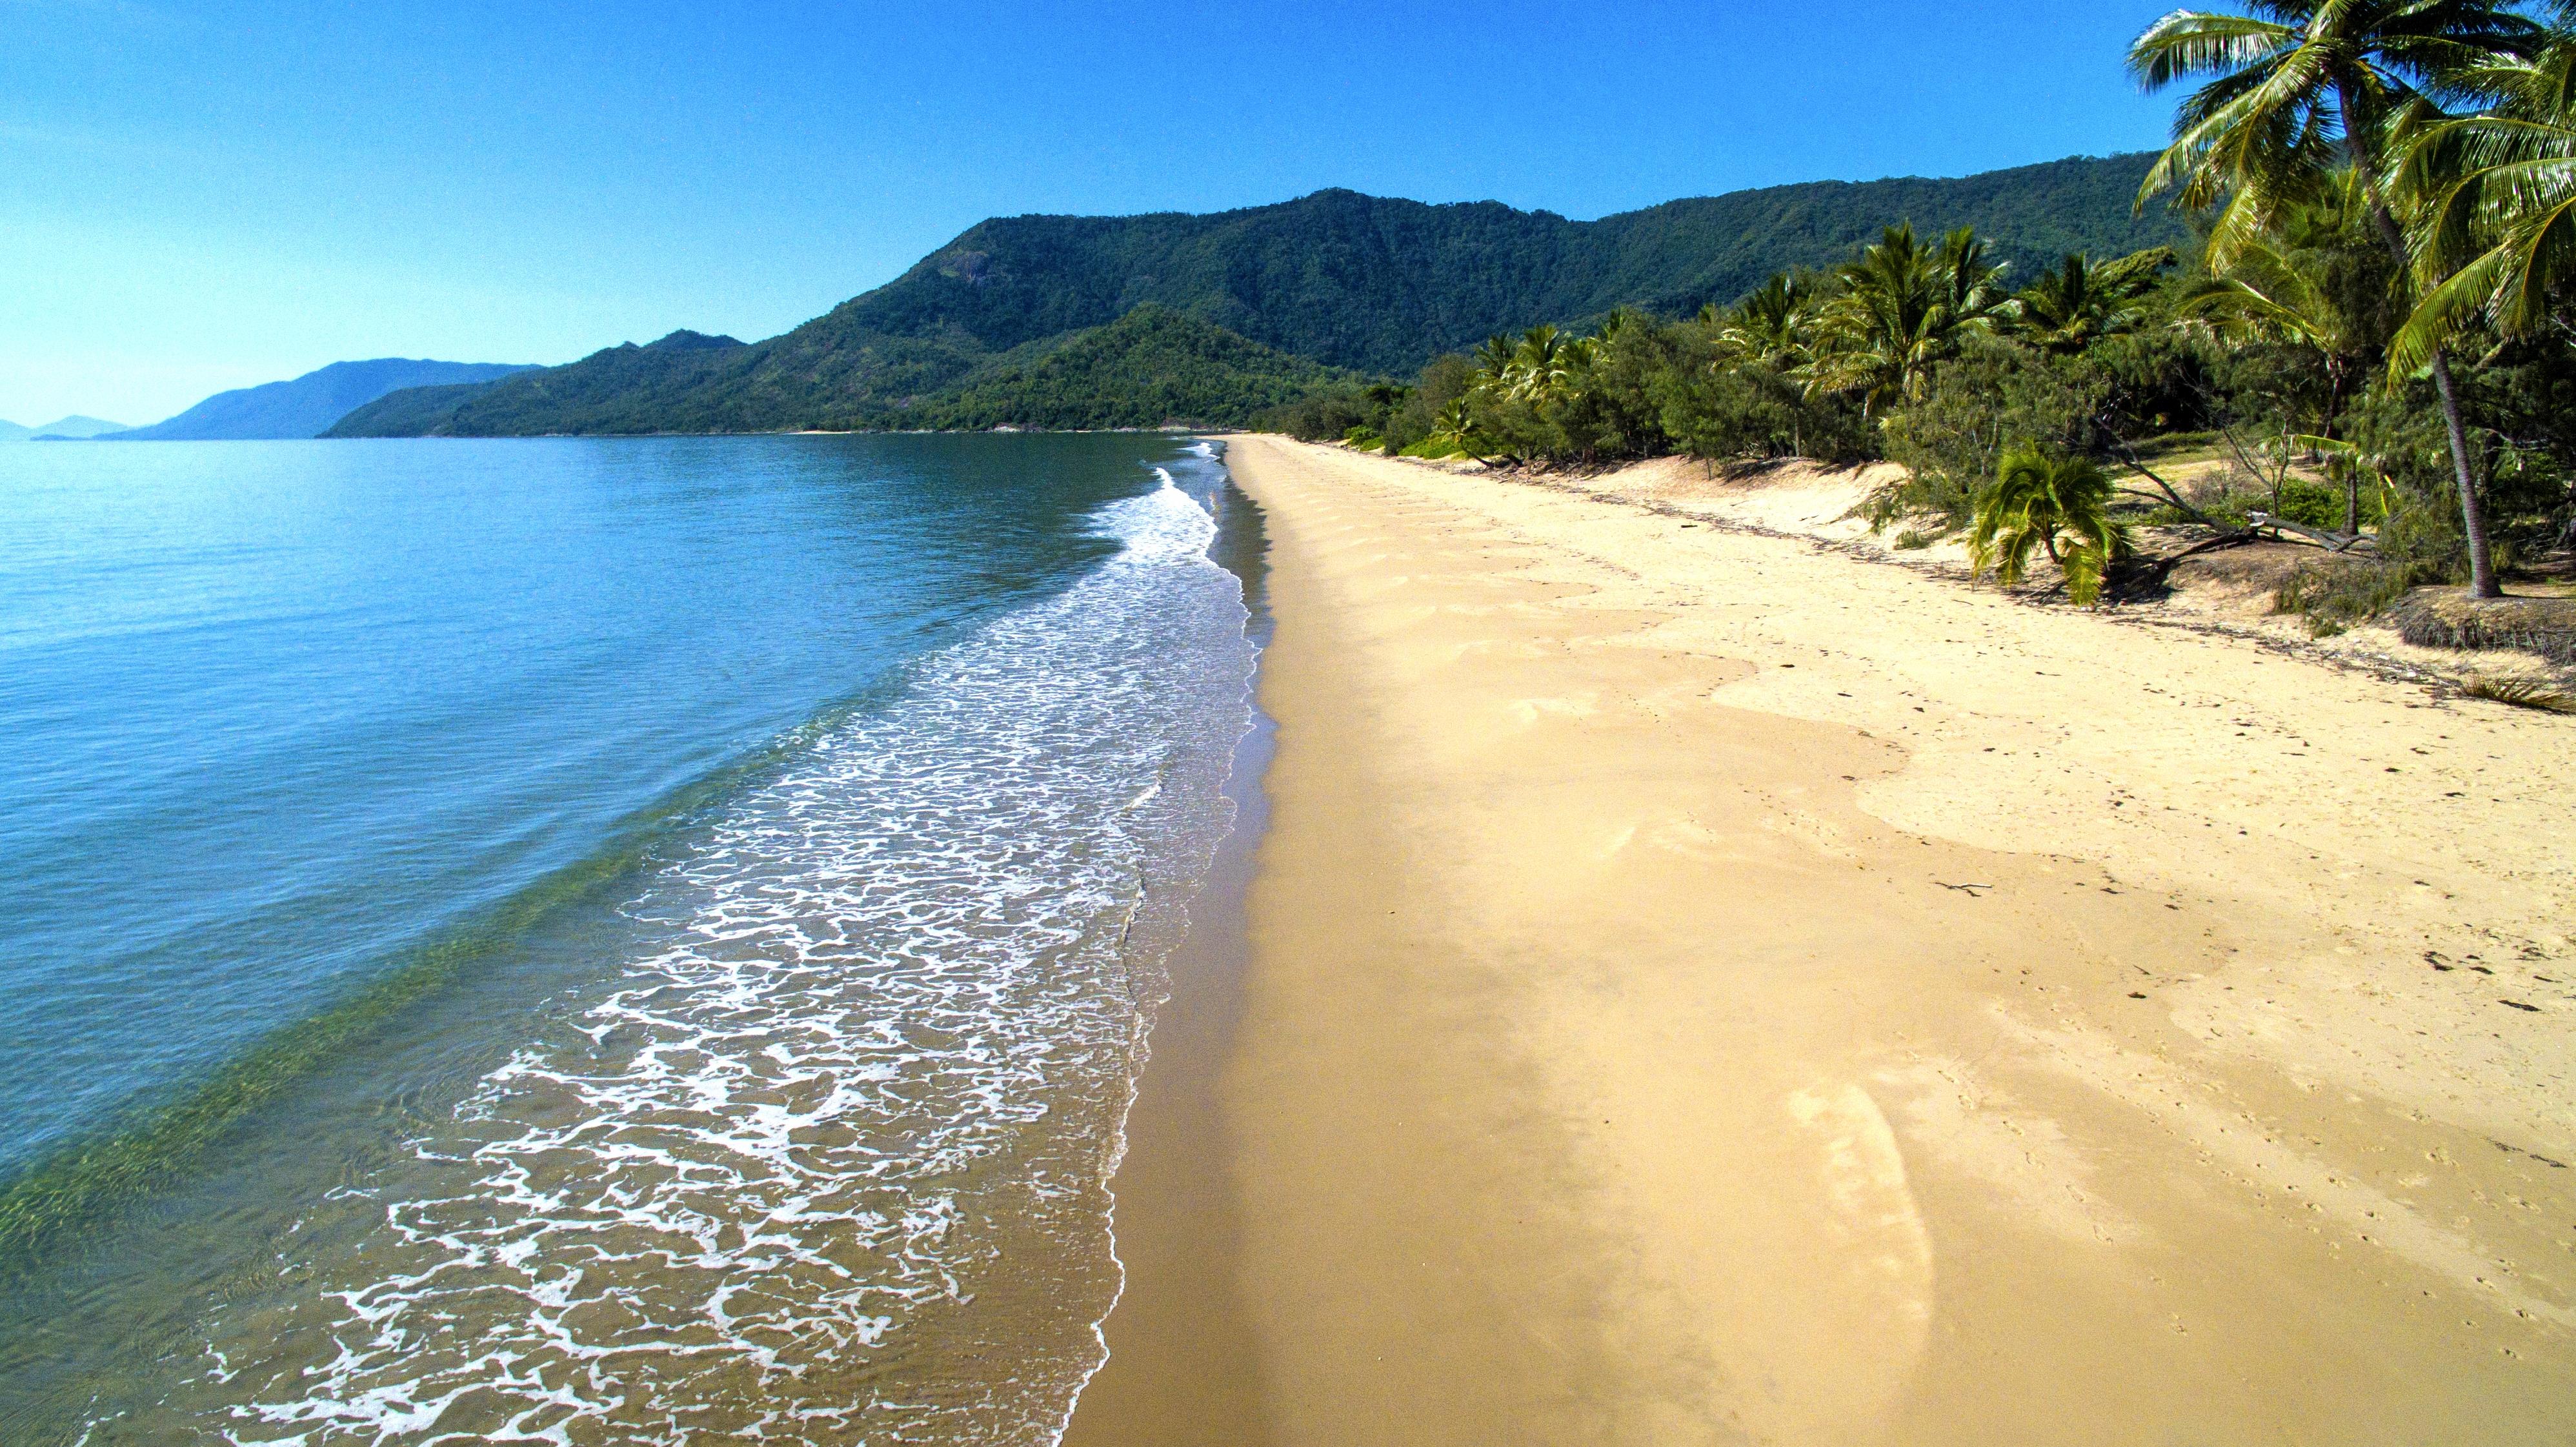 http://www.thalabeach.com.au/wp-content/uploads/2010/07/Thala_Beach_Nature_Reserve_2016__179.jpg